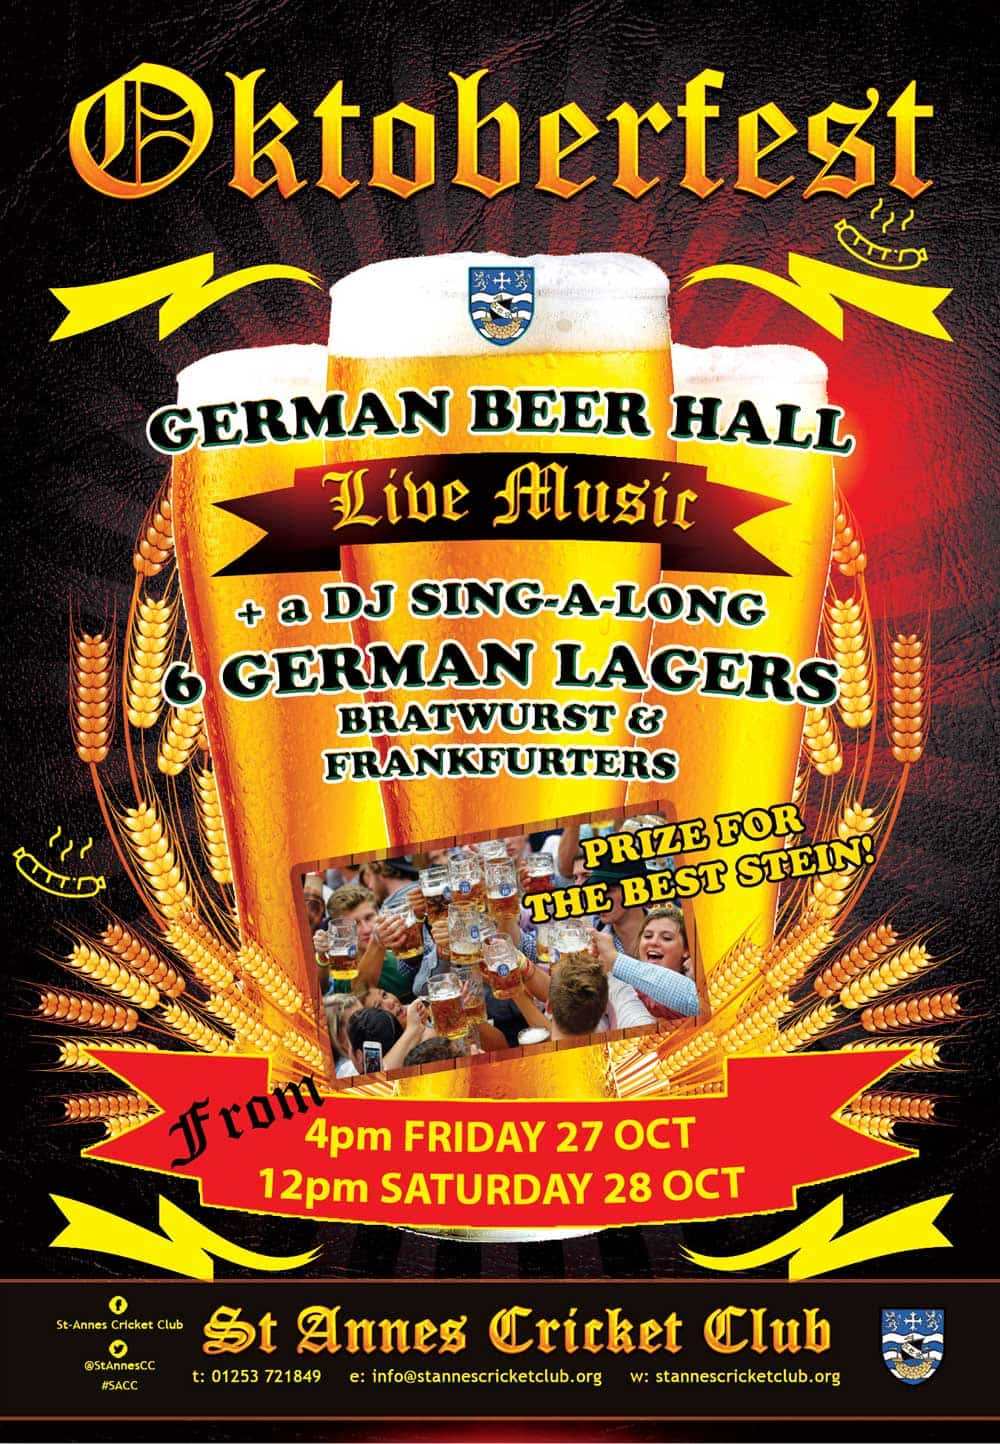 Oktoberfest Beer & Lager festival 2017 St Annes Cricket Club